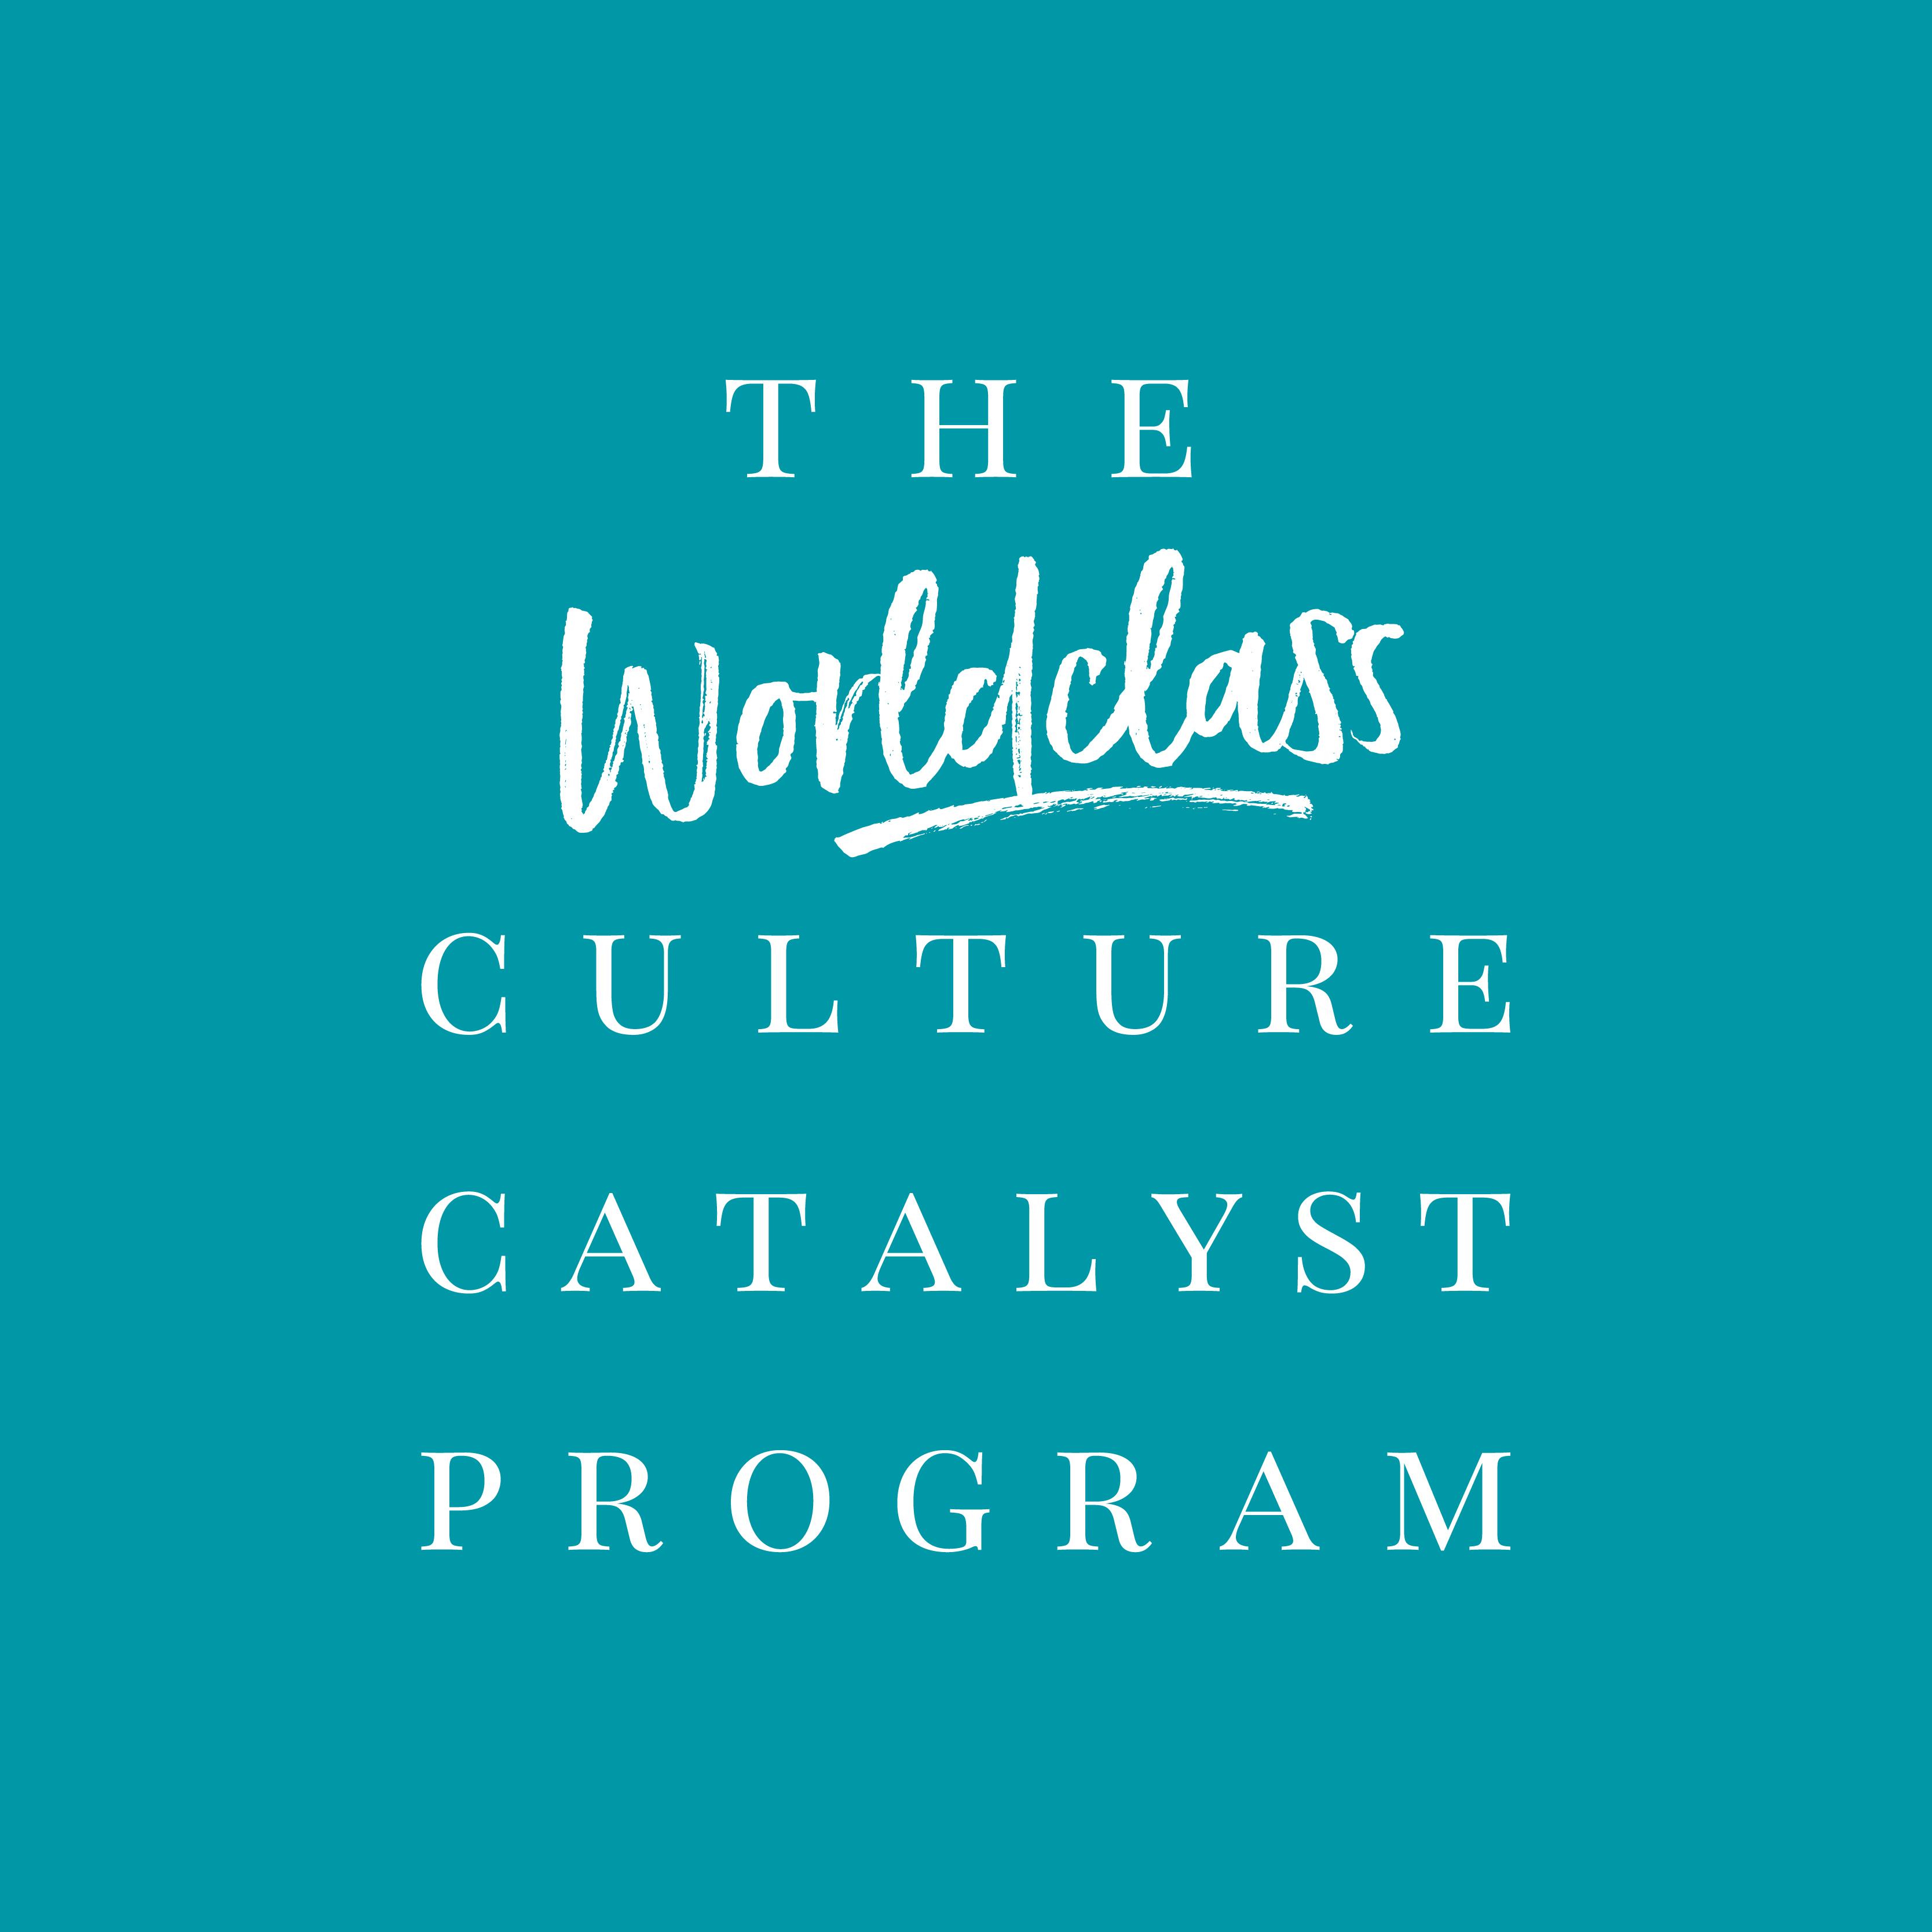 The Worldclass Culture Catalyst Program